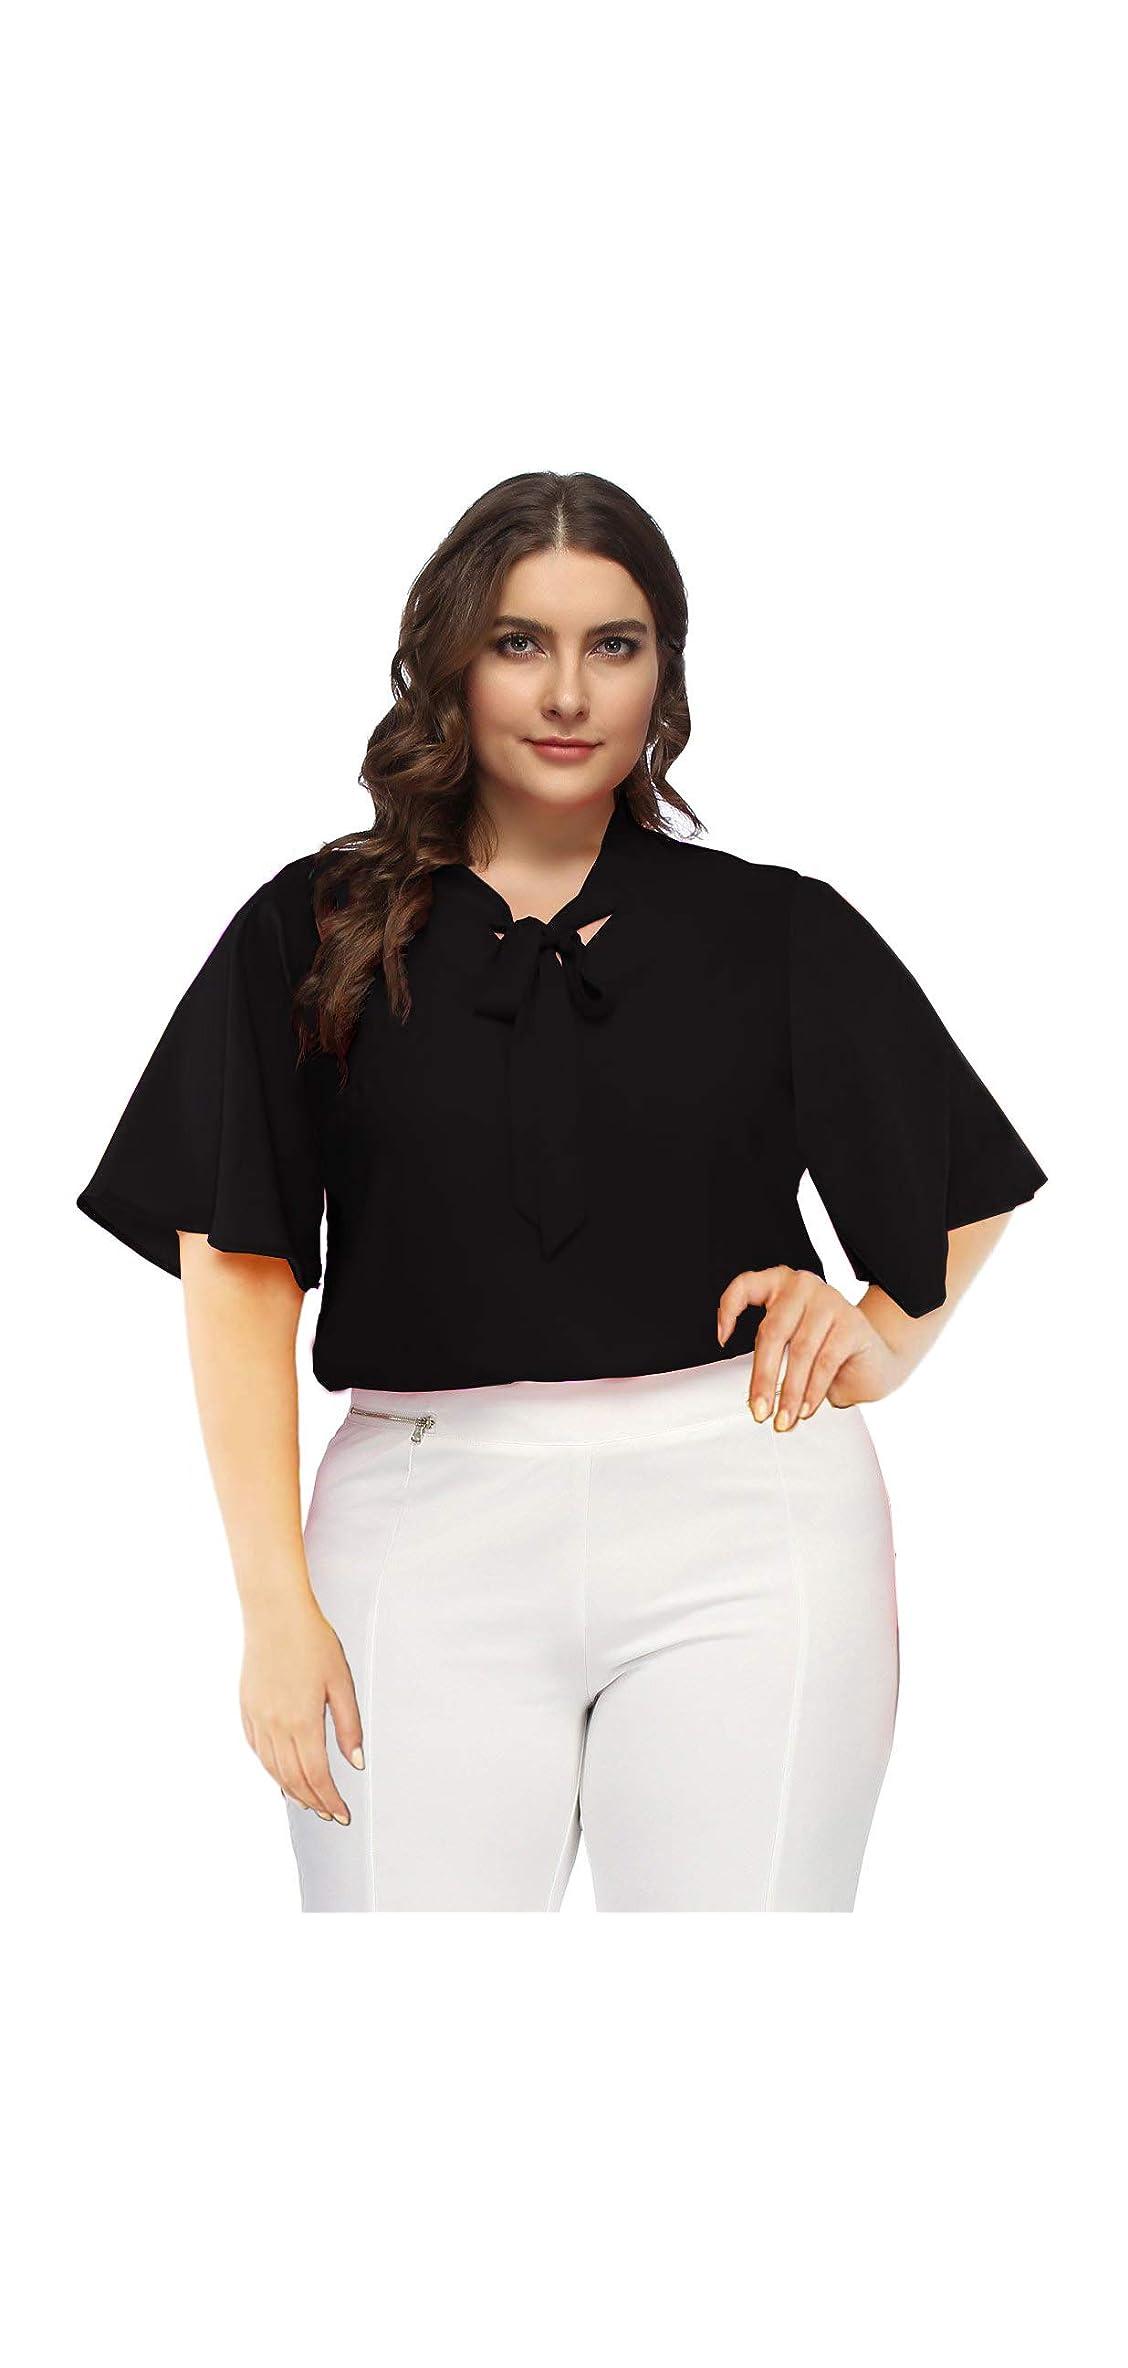 Women Plus Size Chiffon Shirt Bow Tie Neck Office